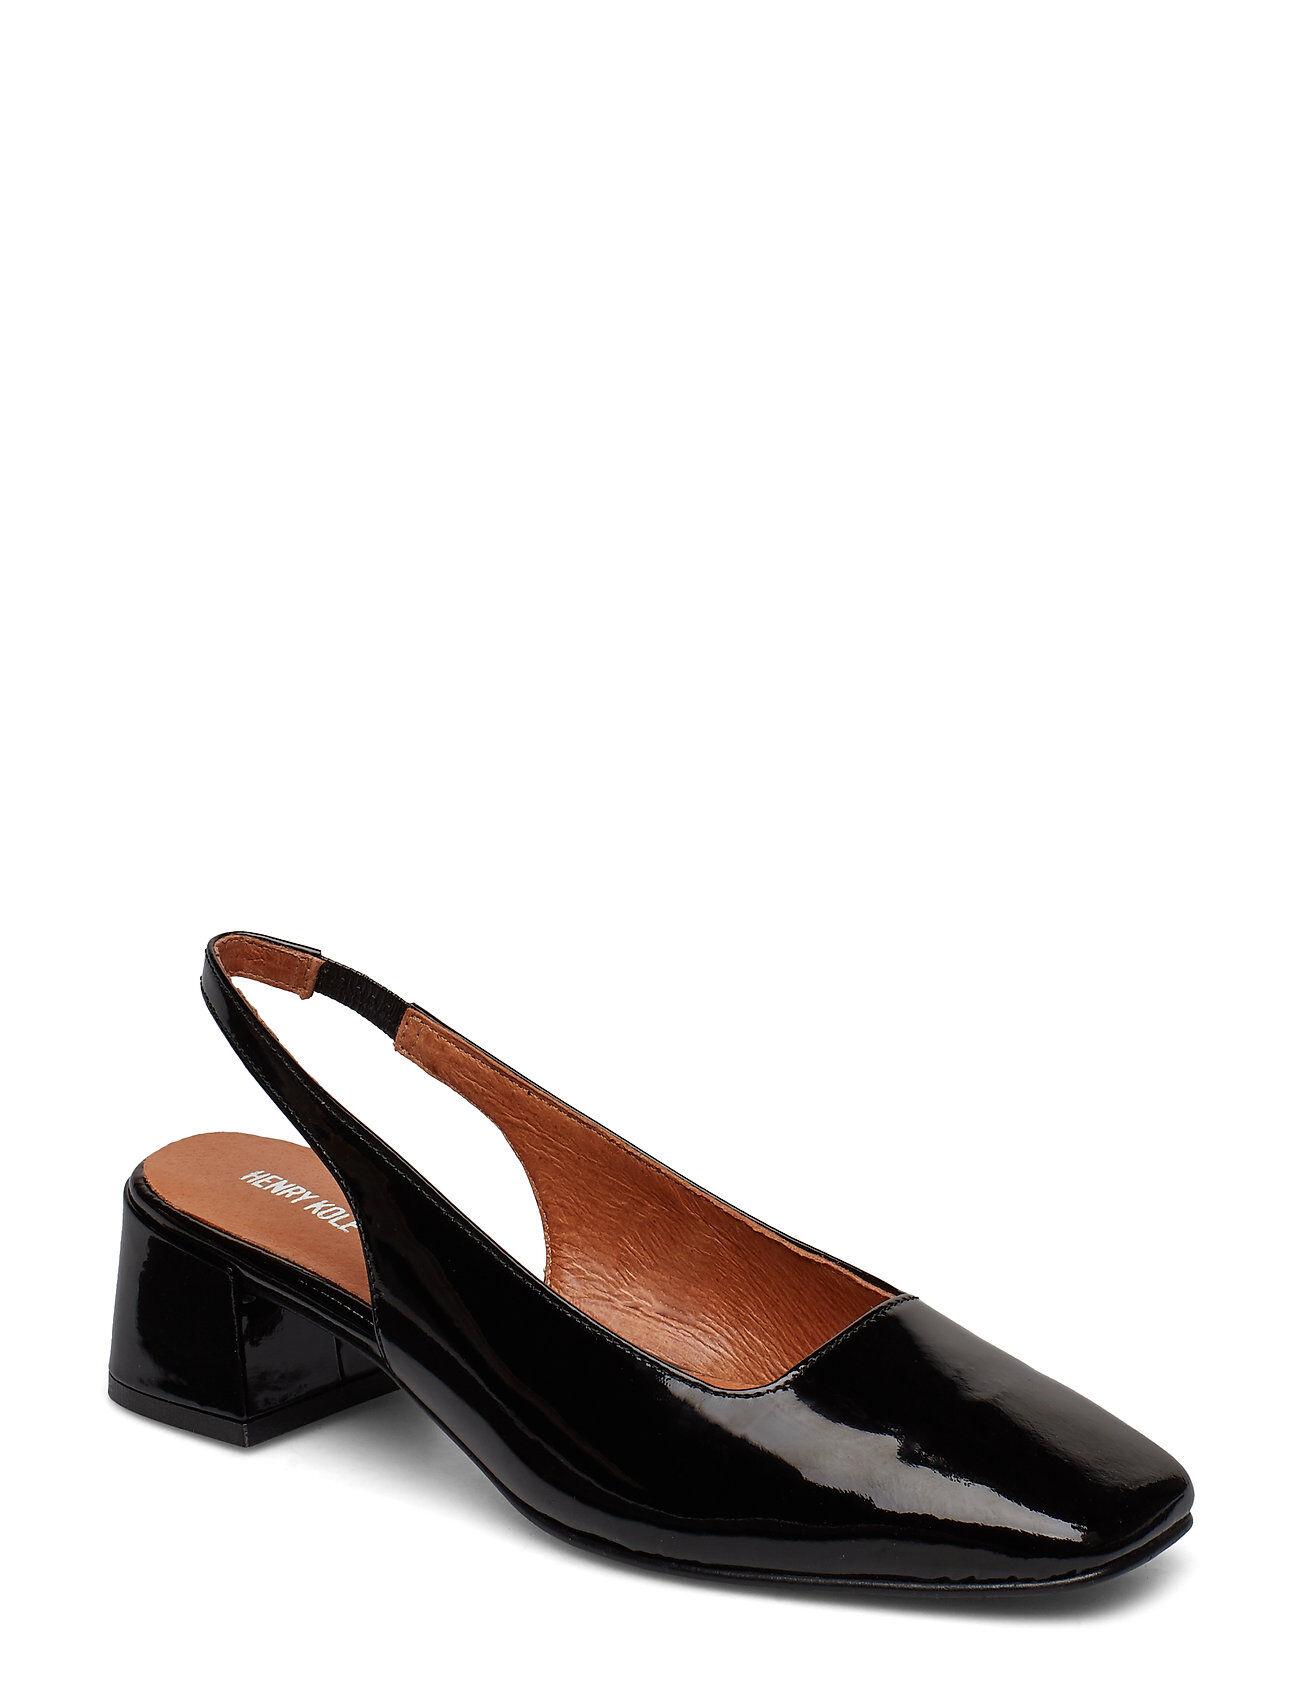 Henry Kole Tess Patent Shoes Heels Pumps Sling Backs Musta Henry Kole